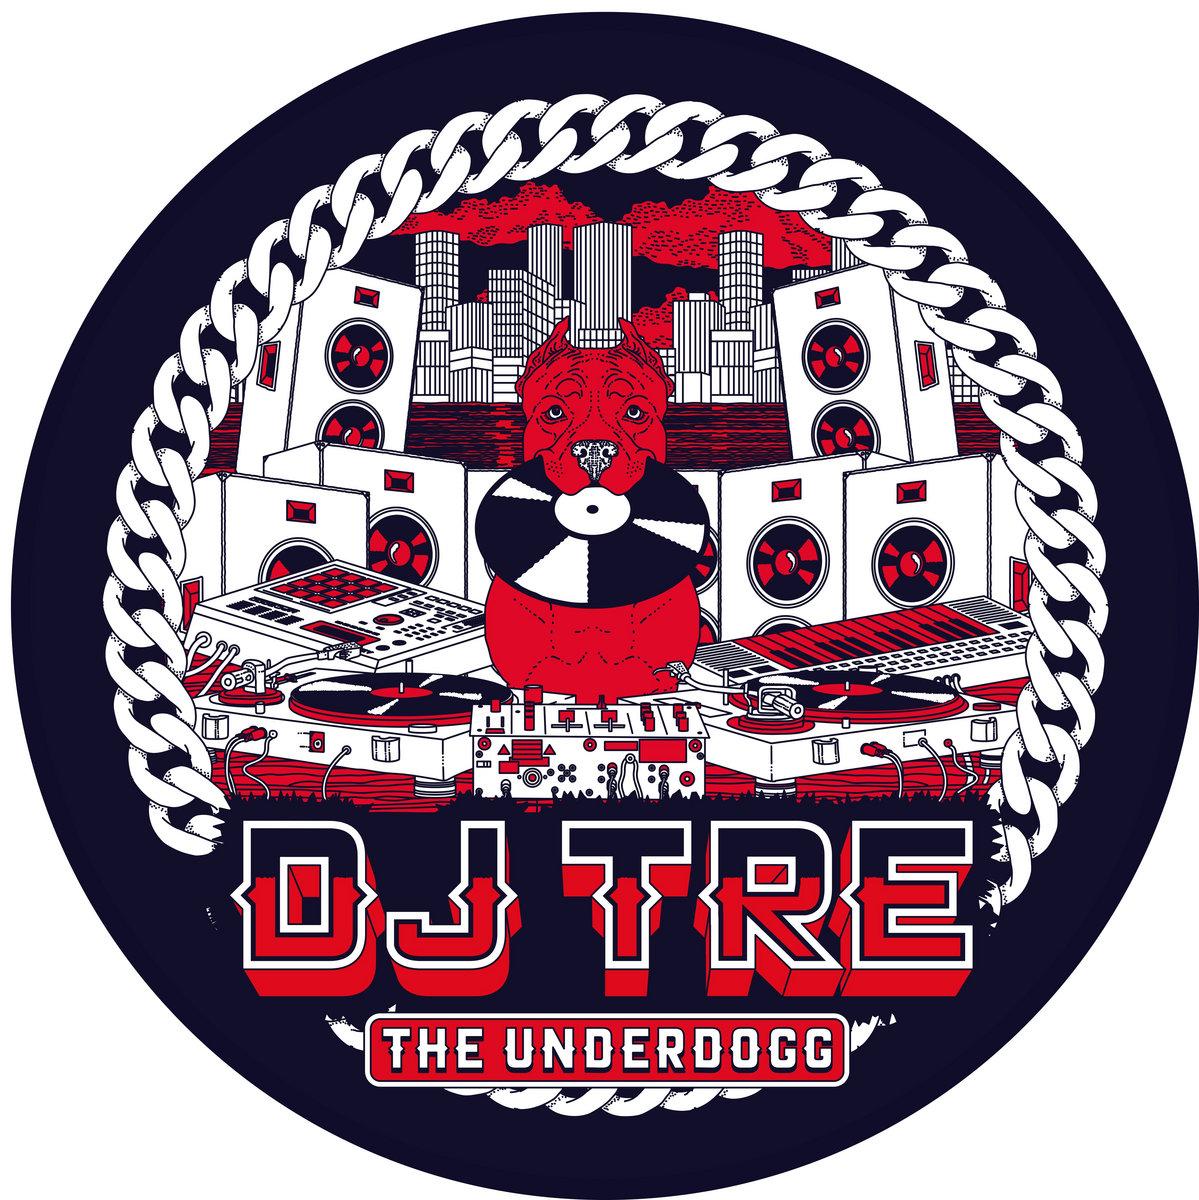 the underdogg ep dj tre